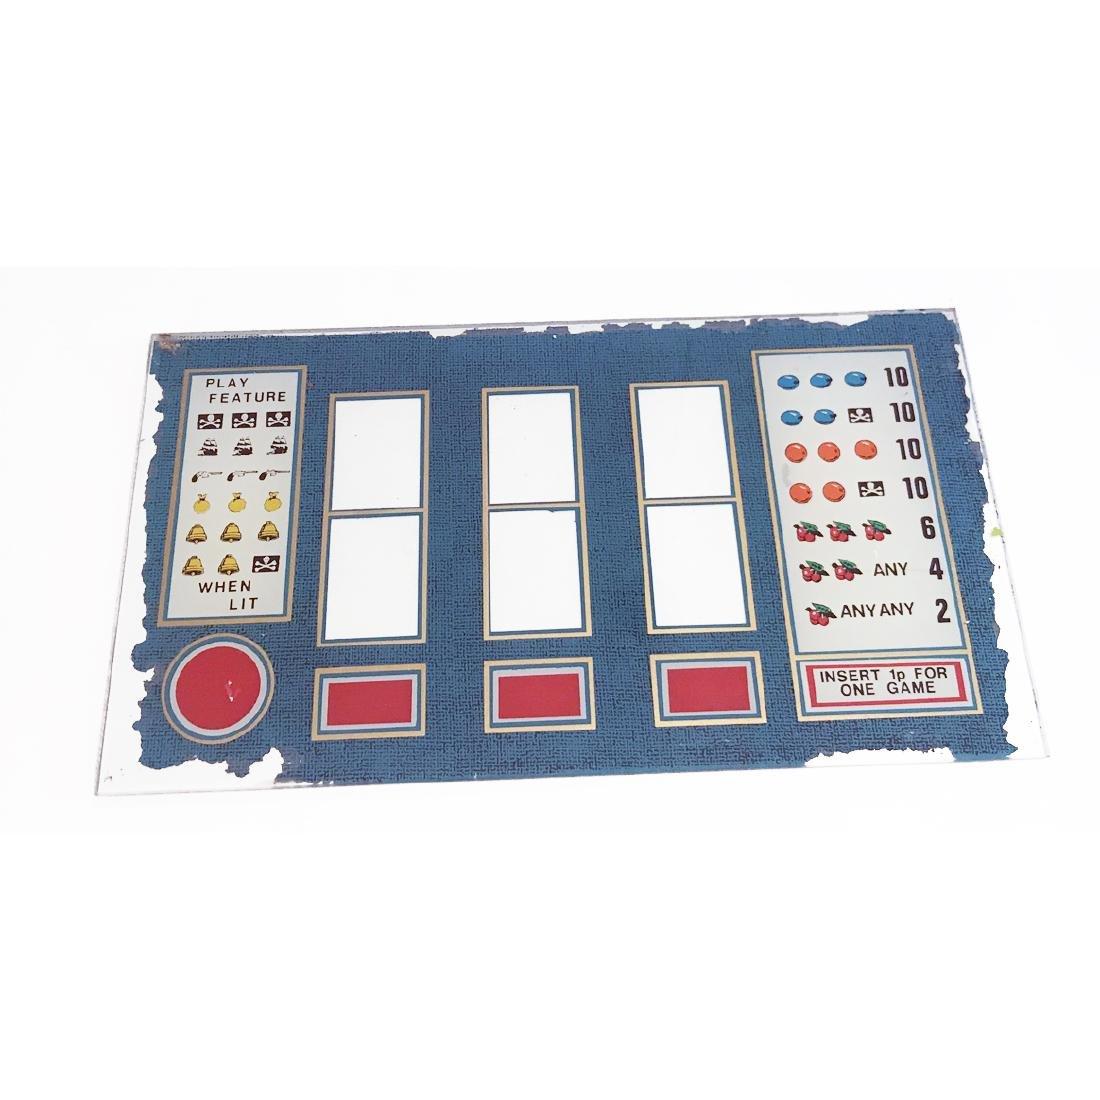 5c Antique Slot Machine Glass